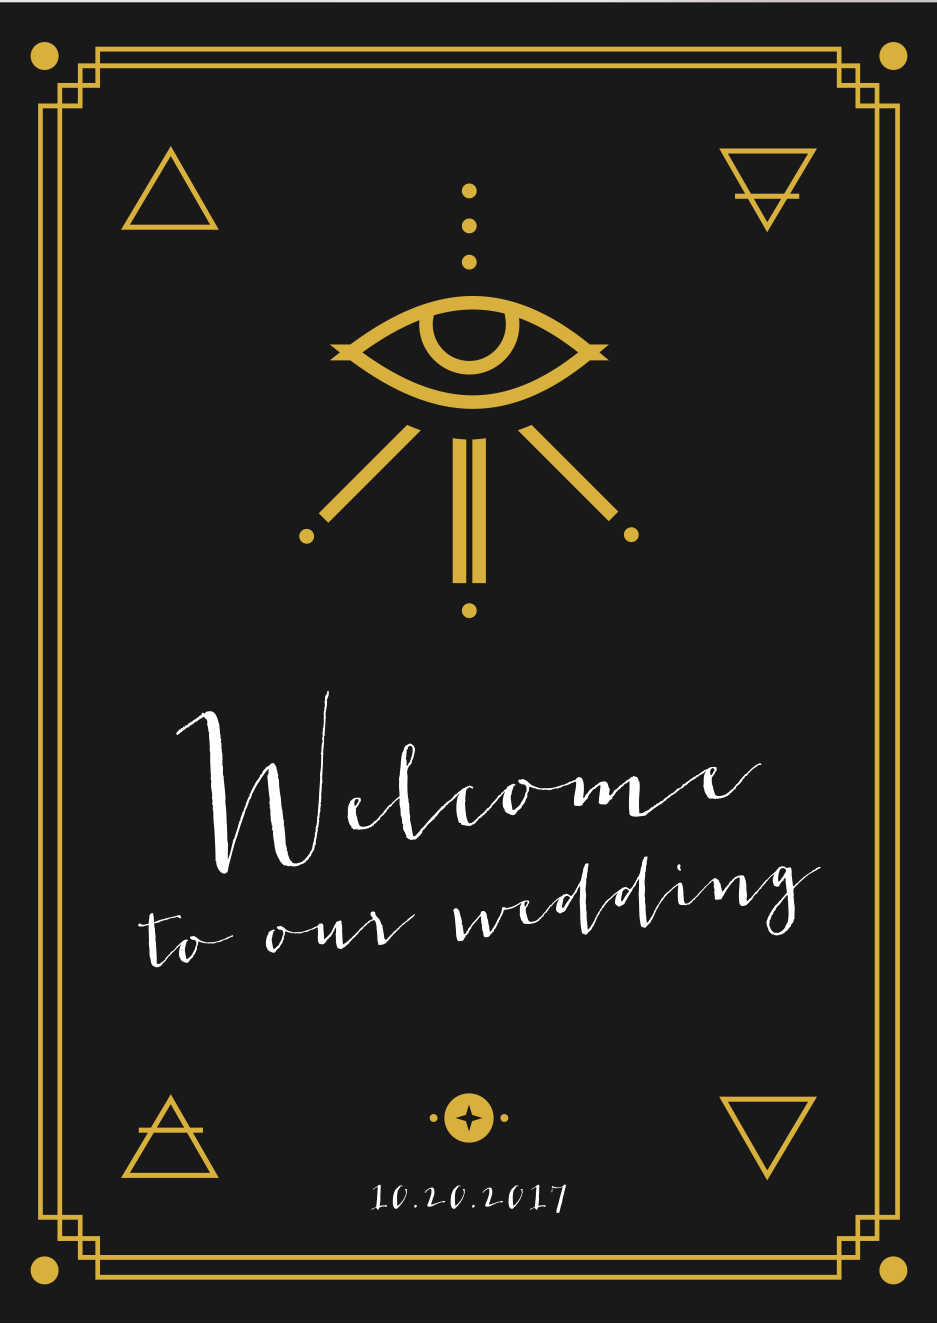 Wedding Welcome Sign - 2017